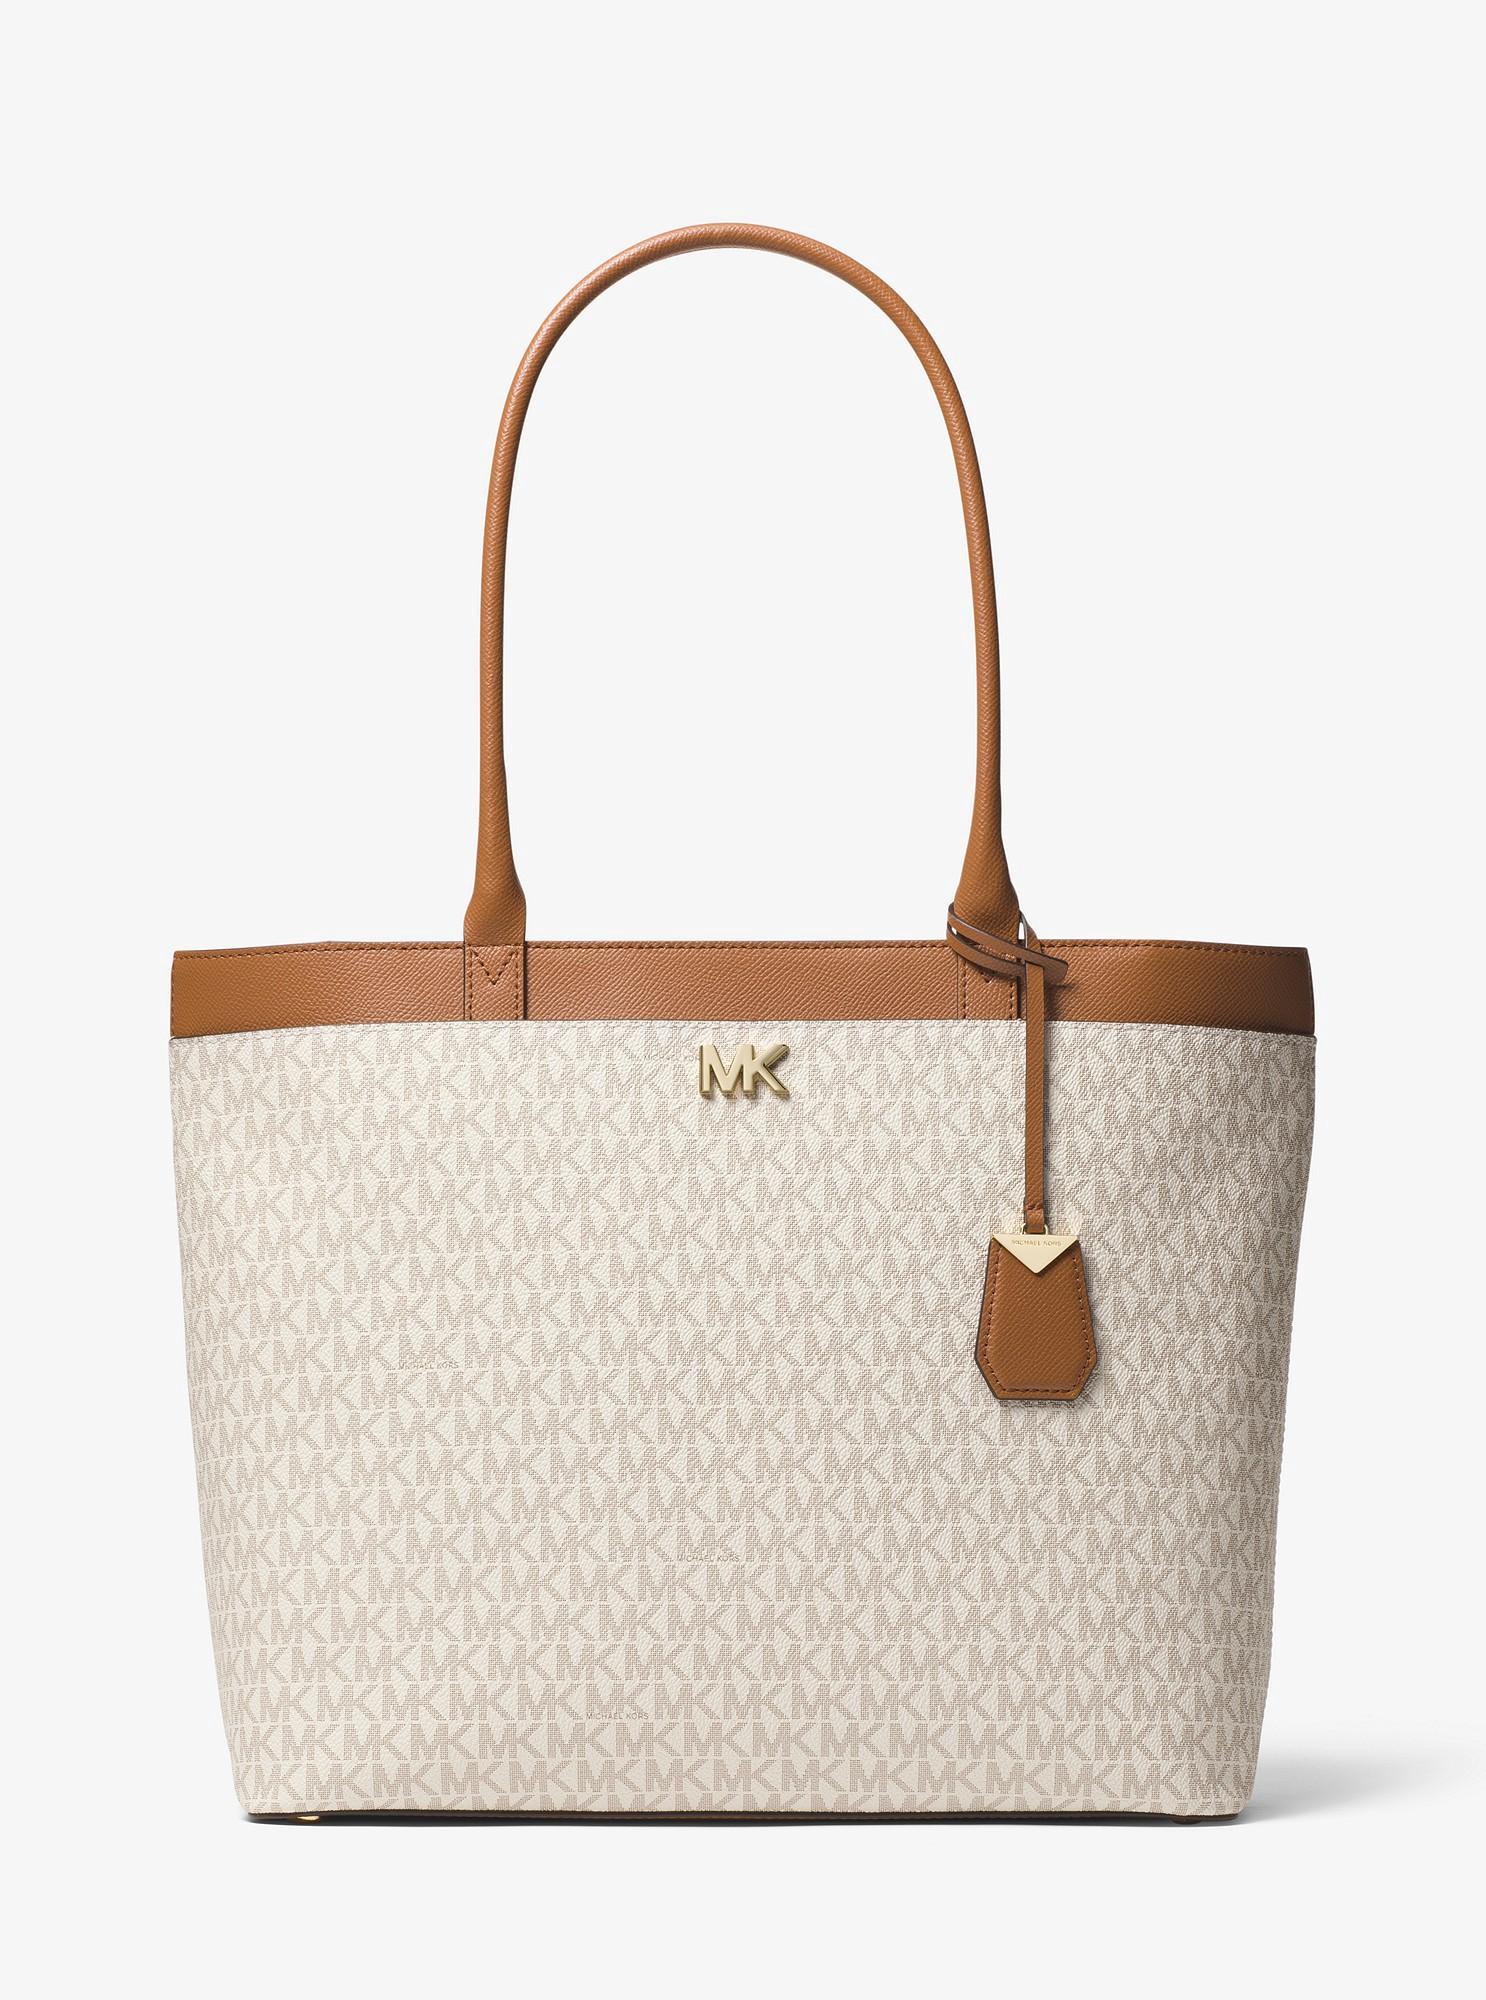 214149b746c1 Michael Kors Maddie Large Logo Tote - Vanilla